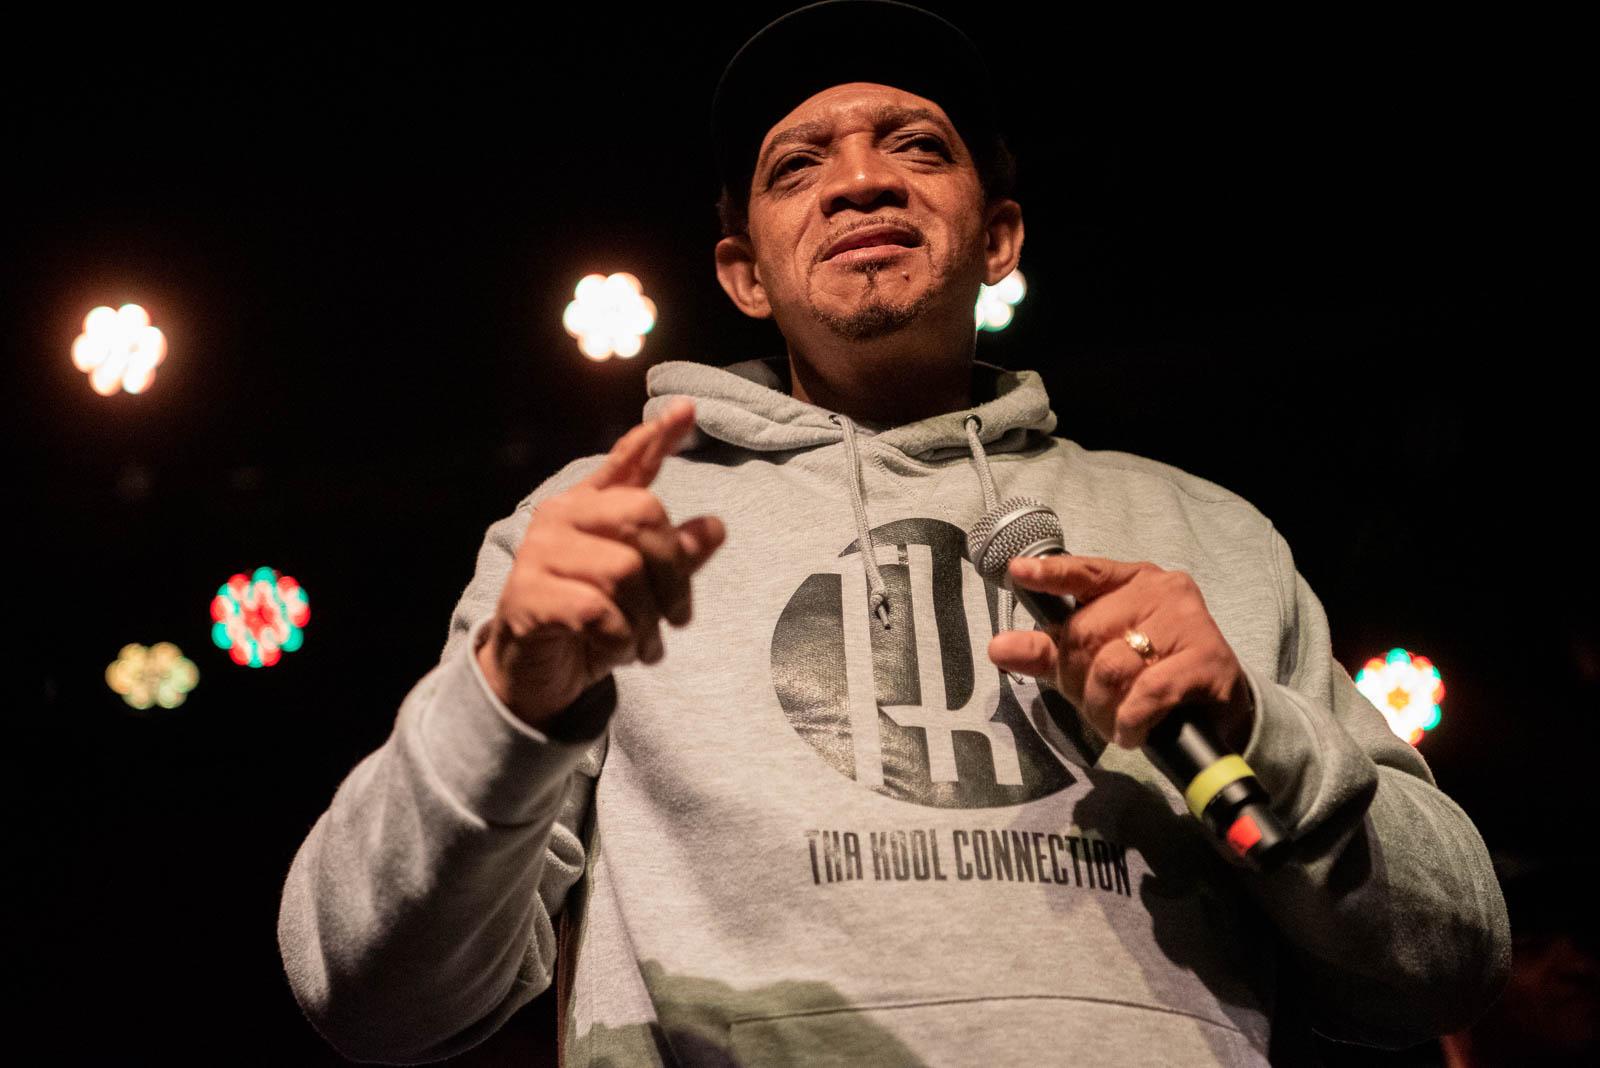 Kool DJ Red Alert during Jungle Brothers set at Brooklyn Bowl on Friday, October 26, 2018.